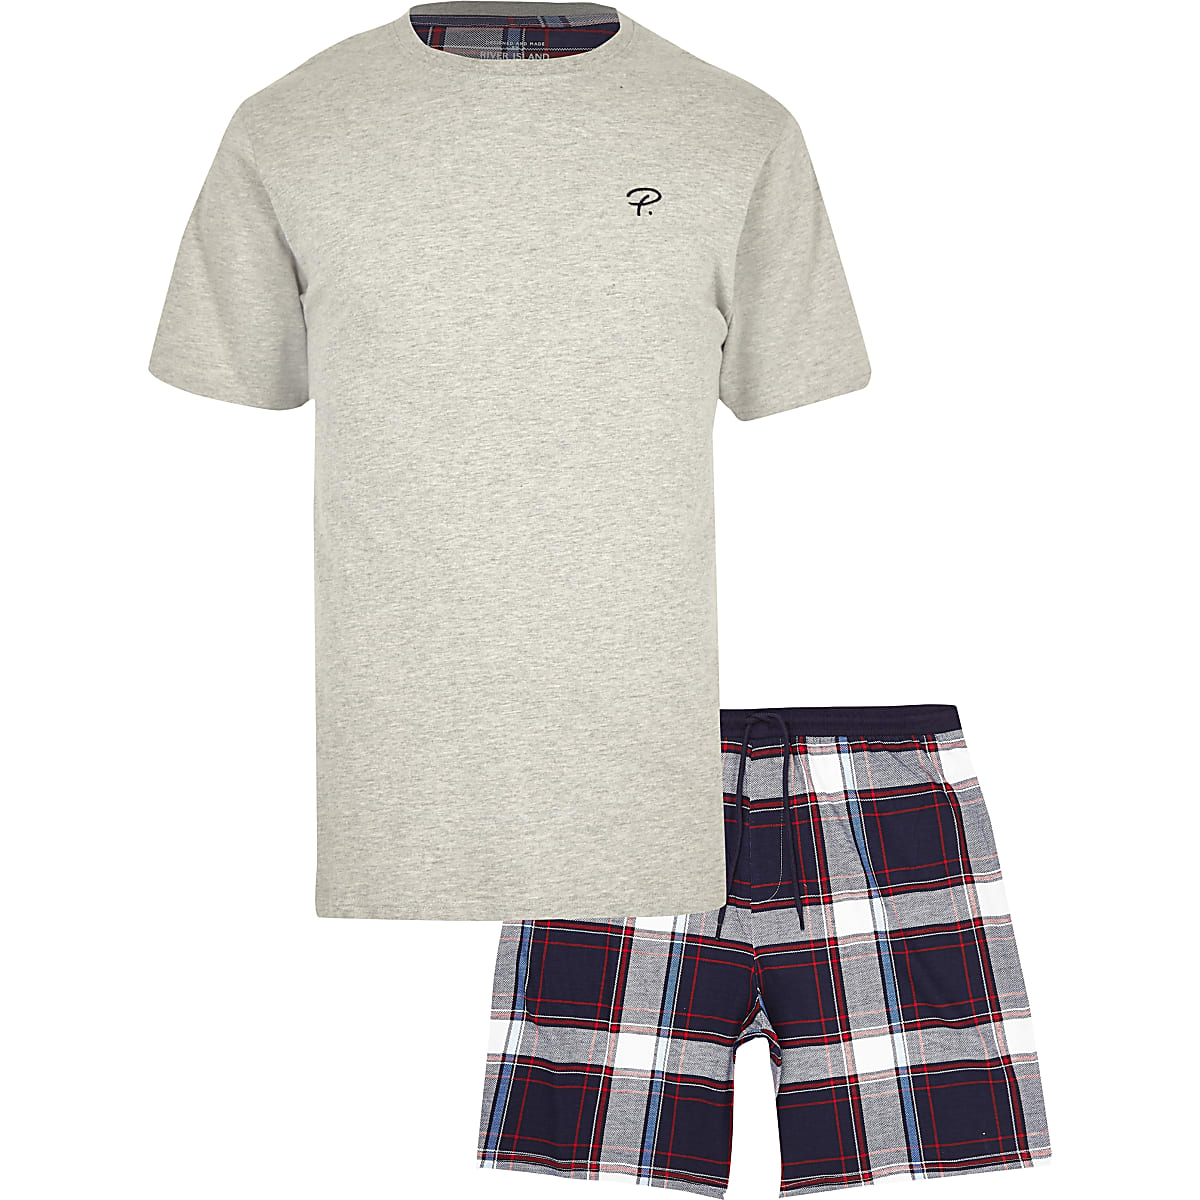 Grey 'Prolific' check pajama set